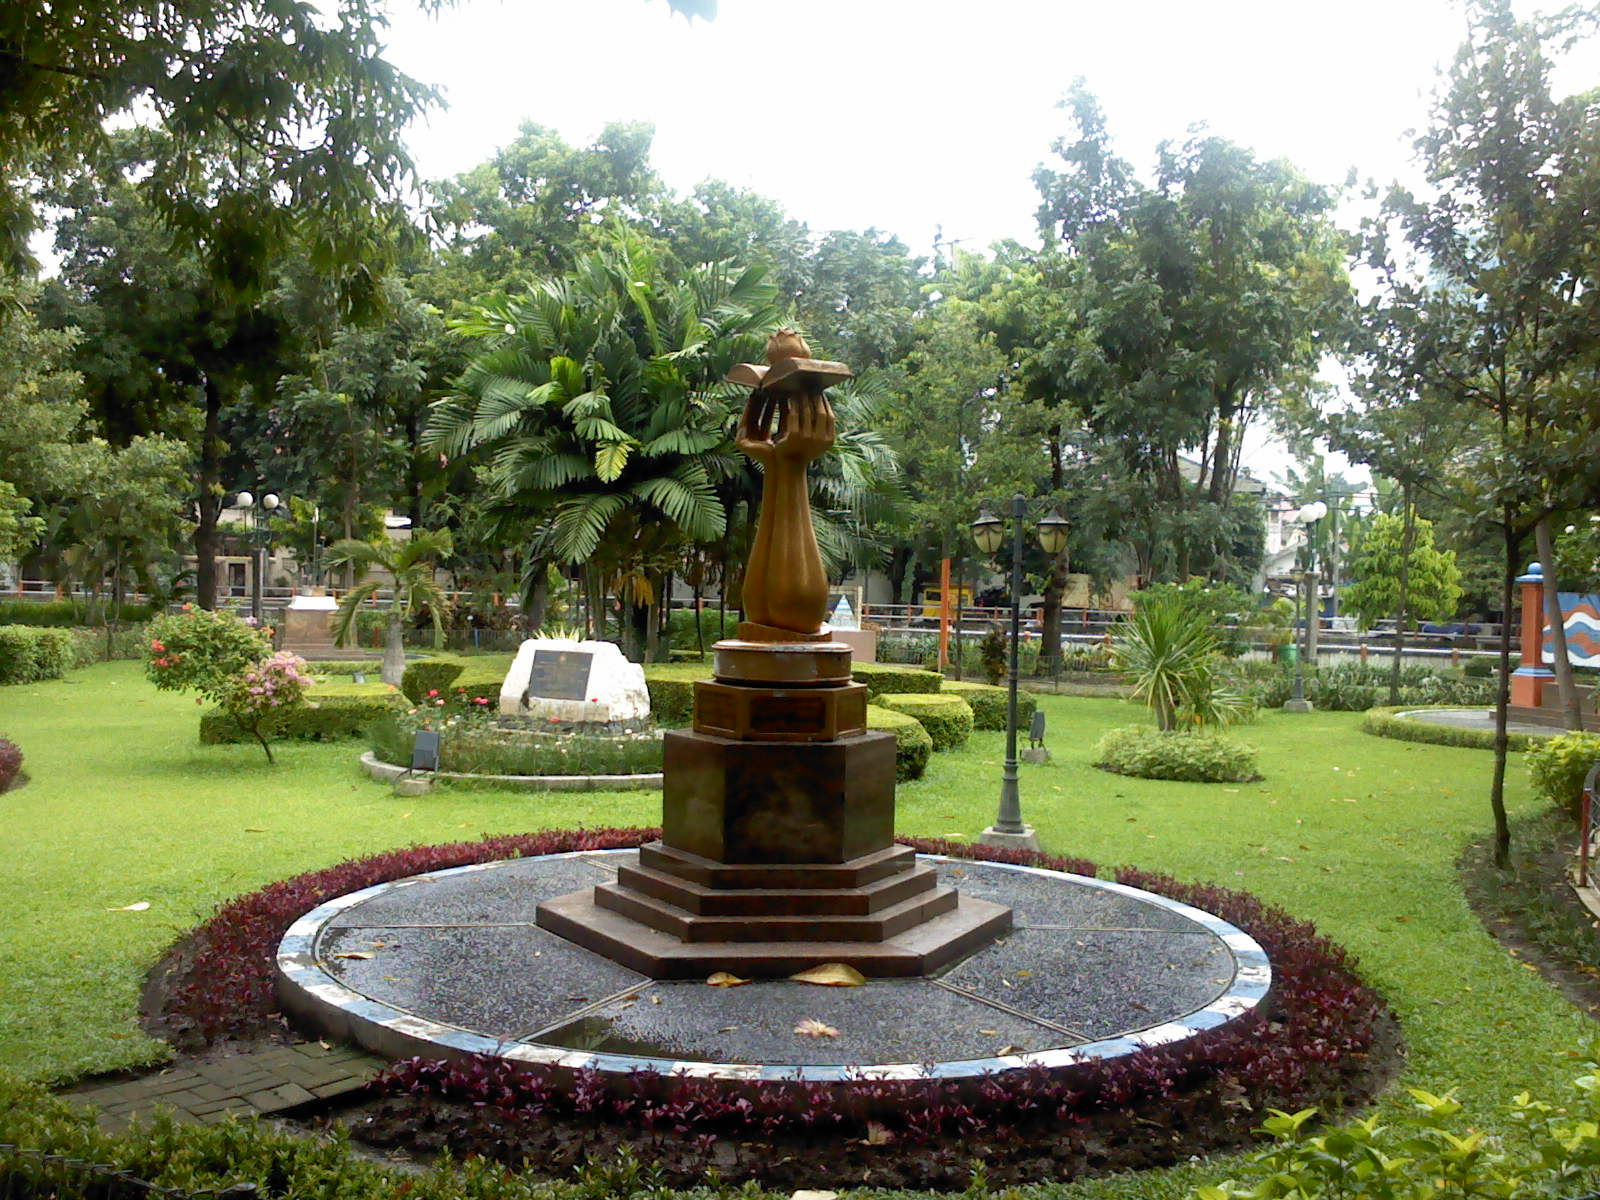 Replika Piala Tata Nugraha Pesona Taman Kota Surabaya Prestasi